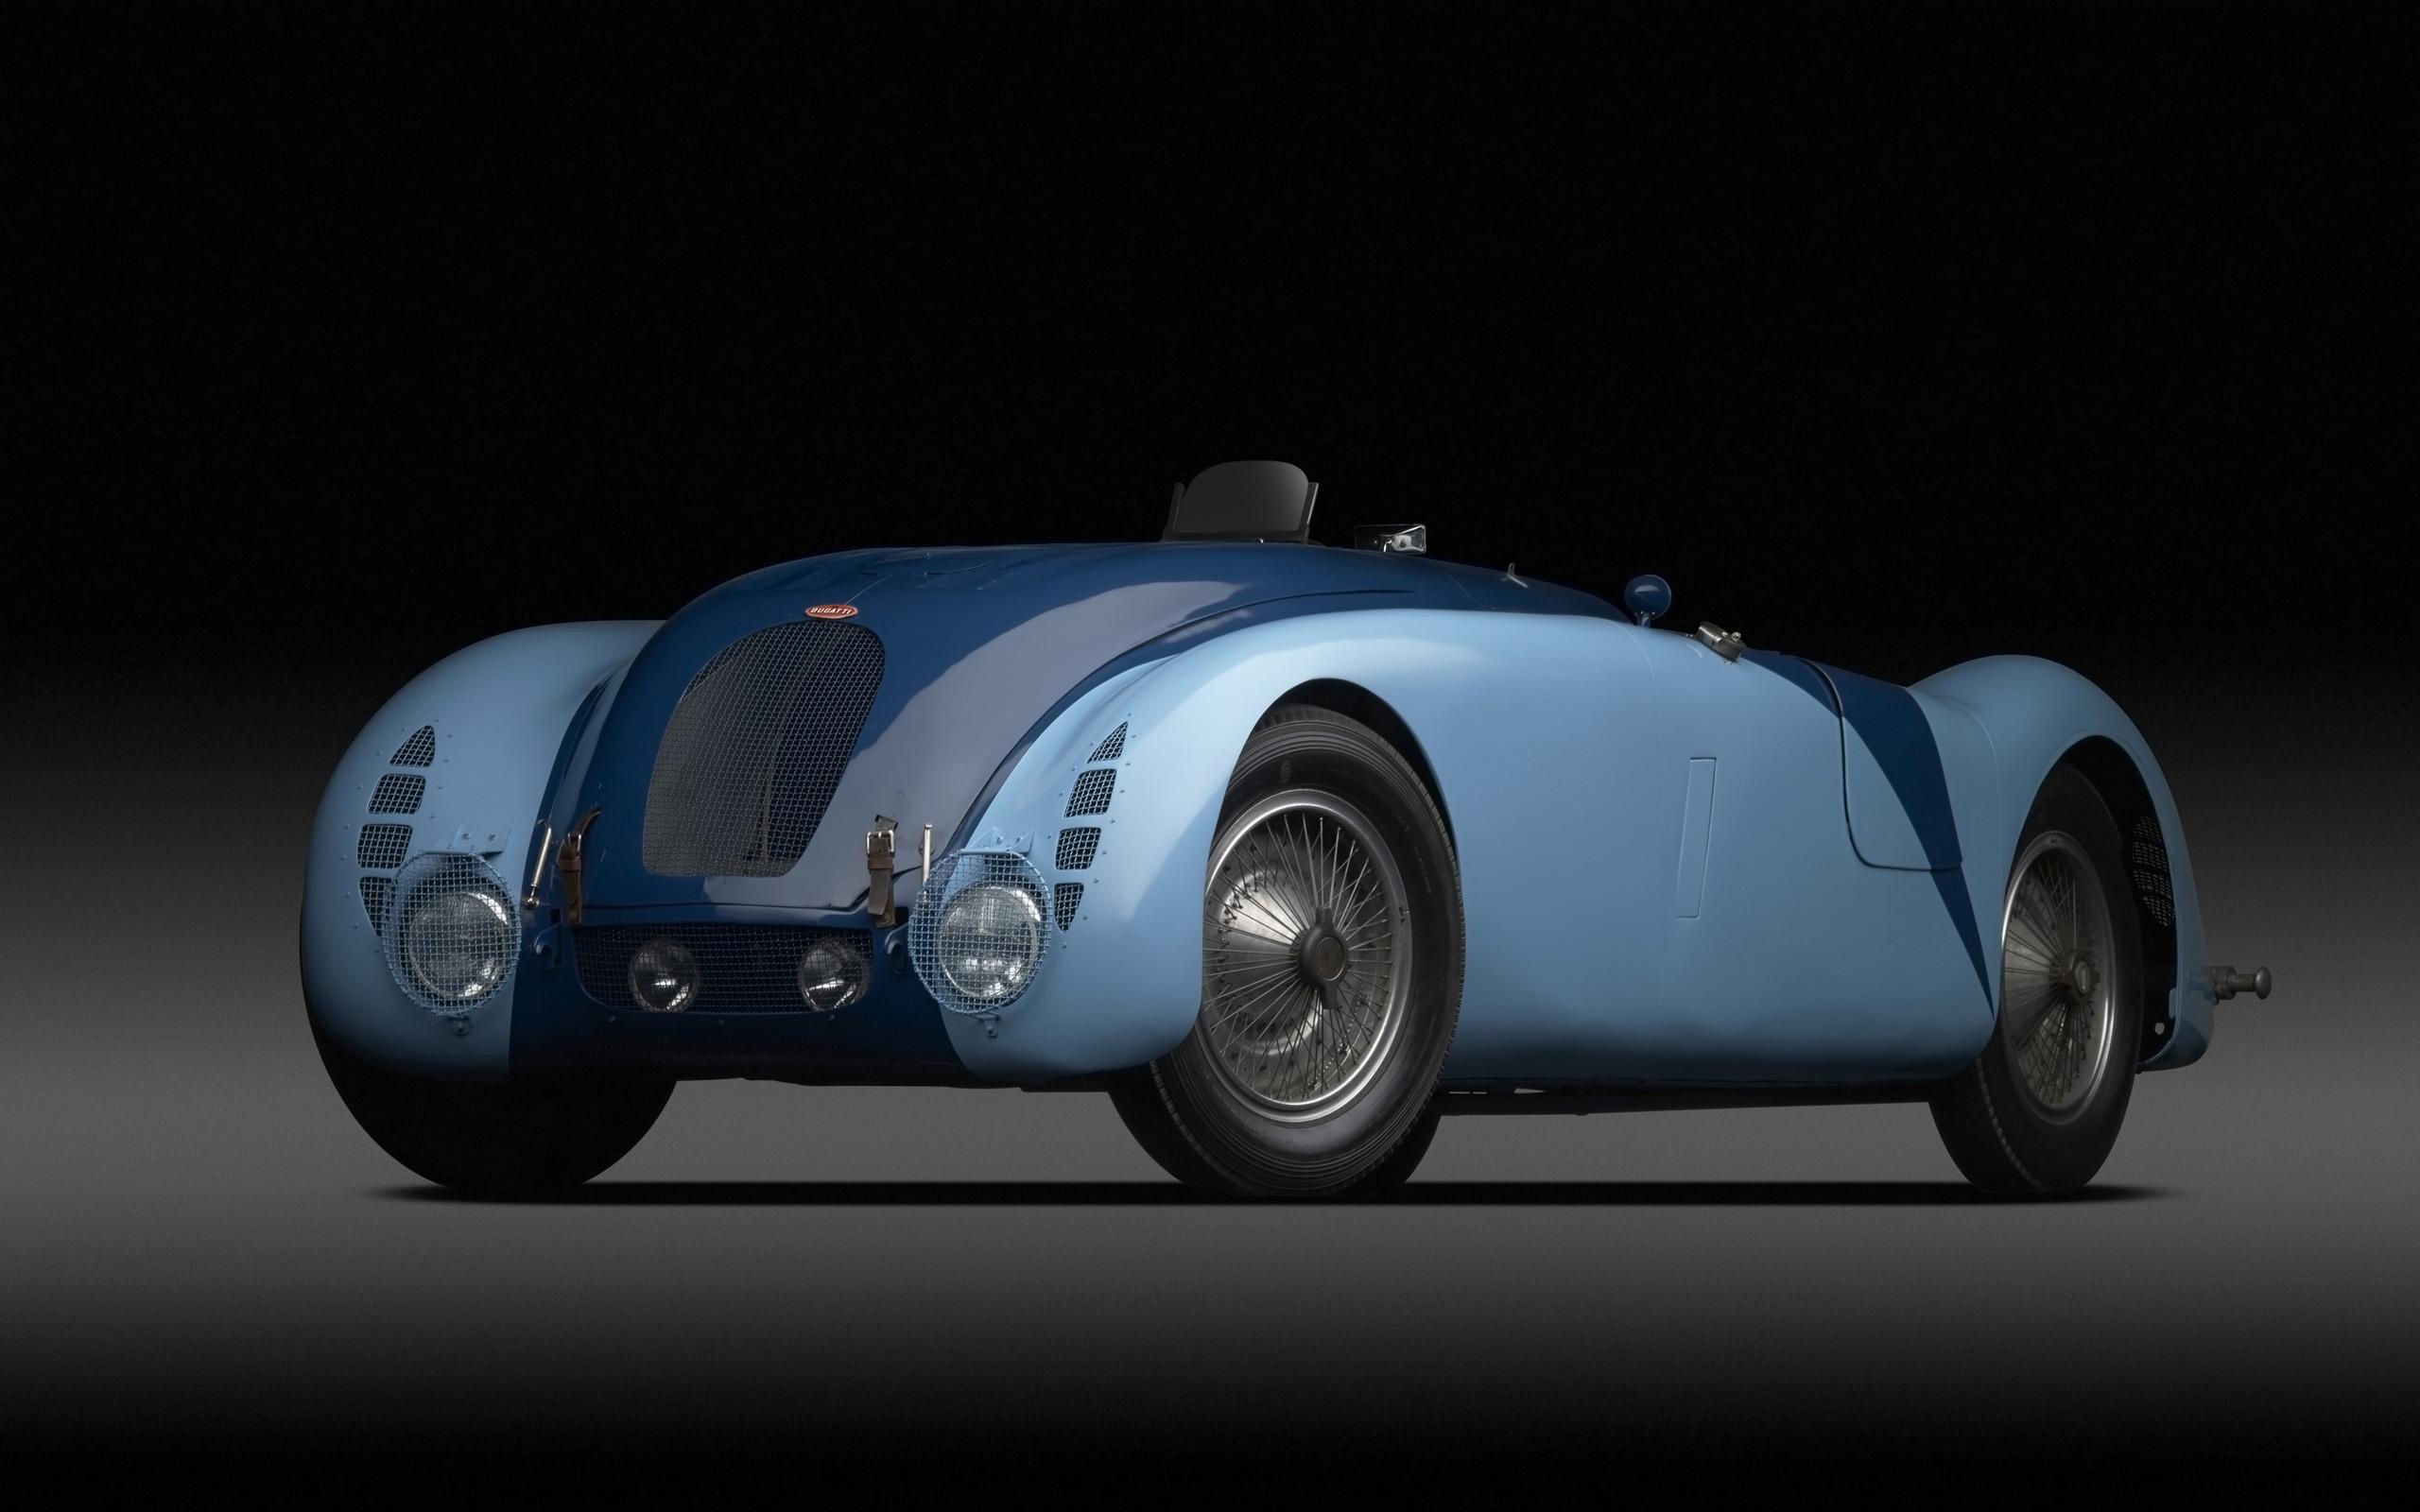 Bugatti Veyron Jean Pierre Wimille Legends Edition Wallpaper | HD Car ...